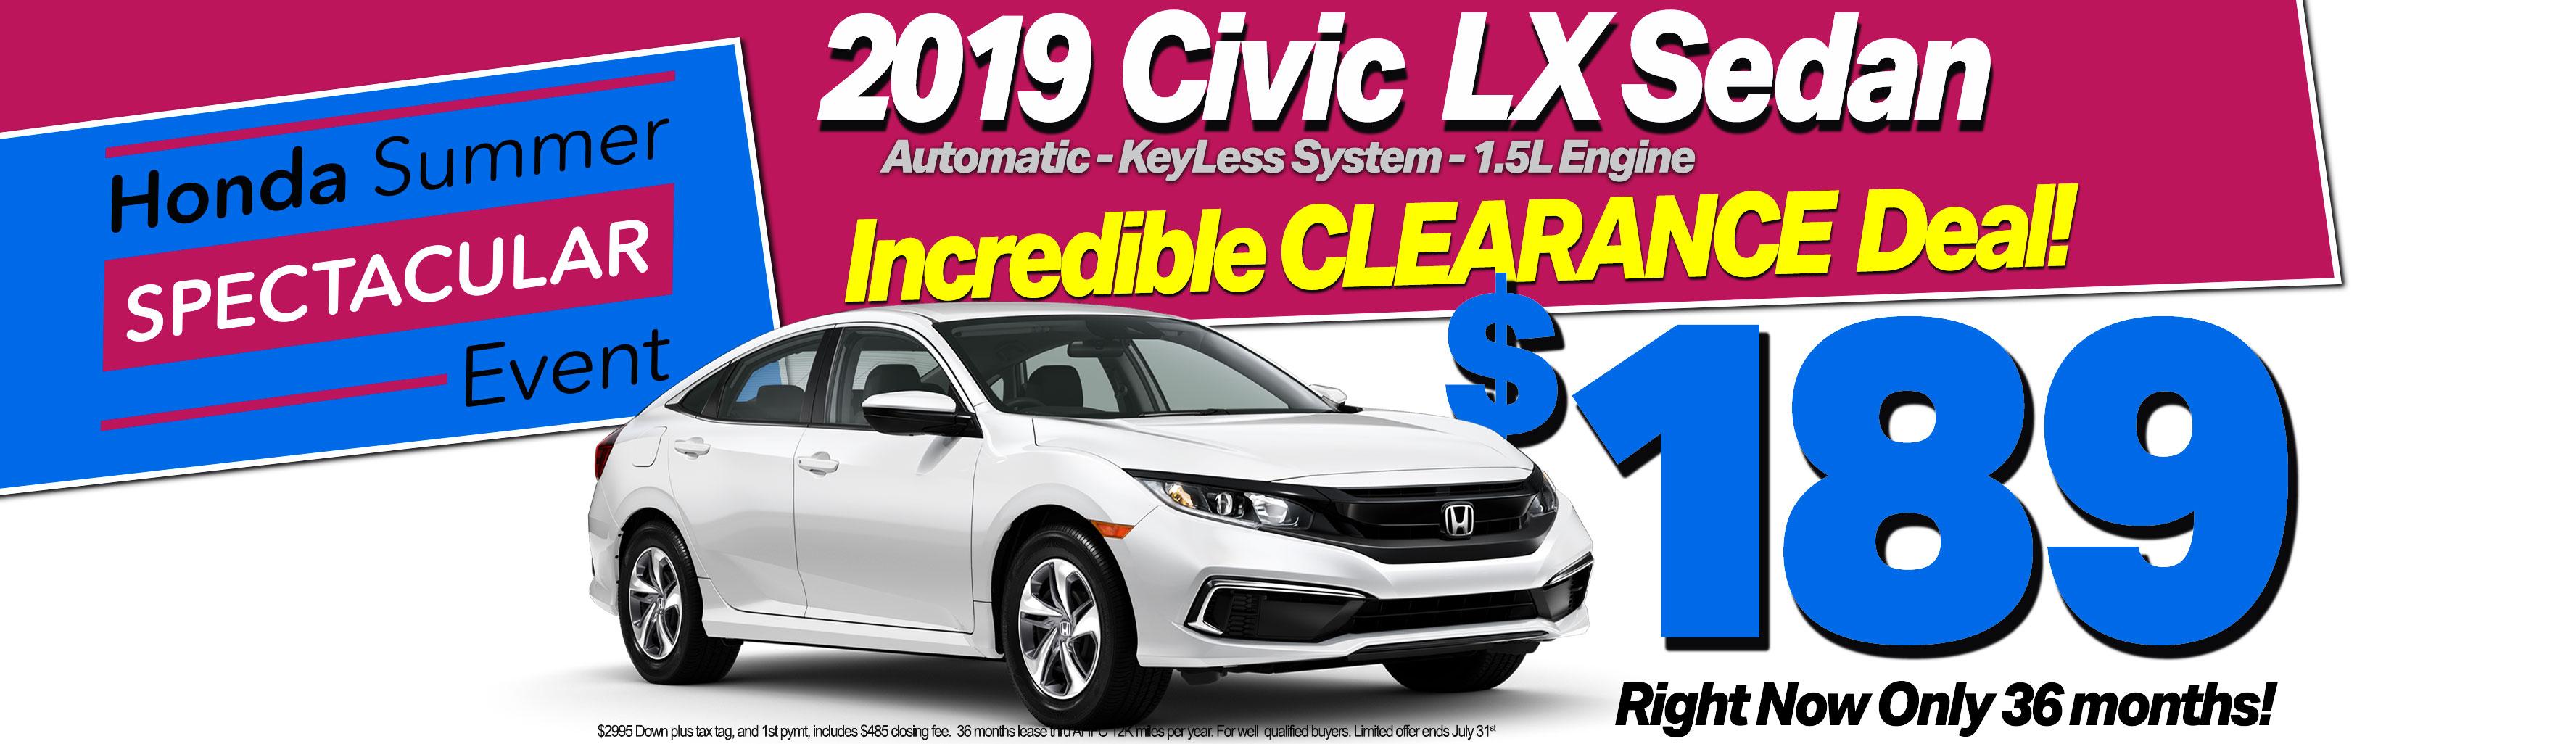 Car Clearance Deals 2016 >> Midlands Honda Honda Dealership Columbia Sc Near Lexington